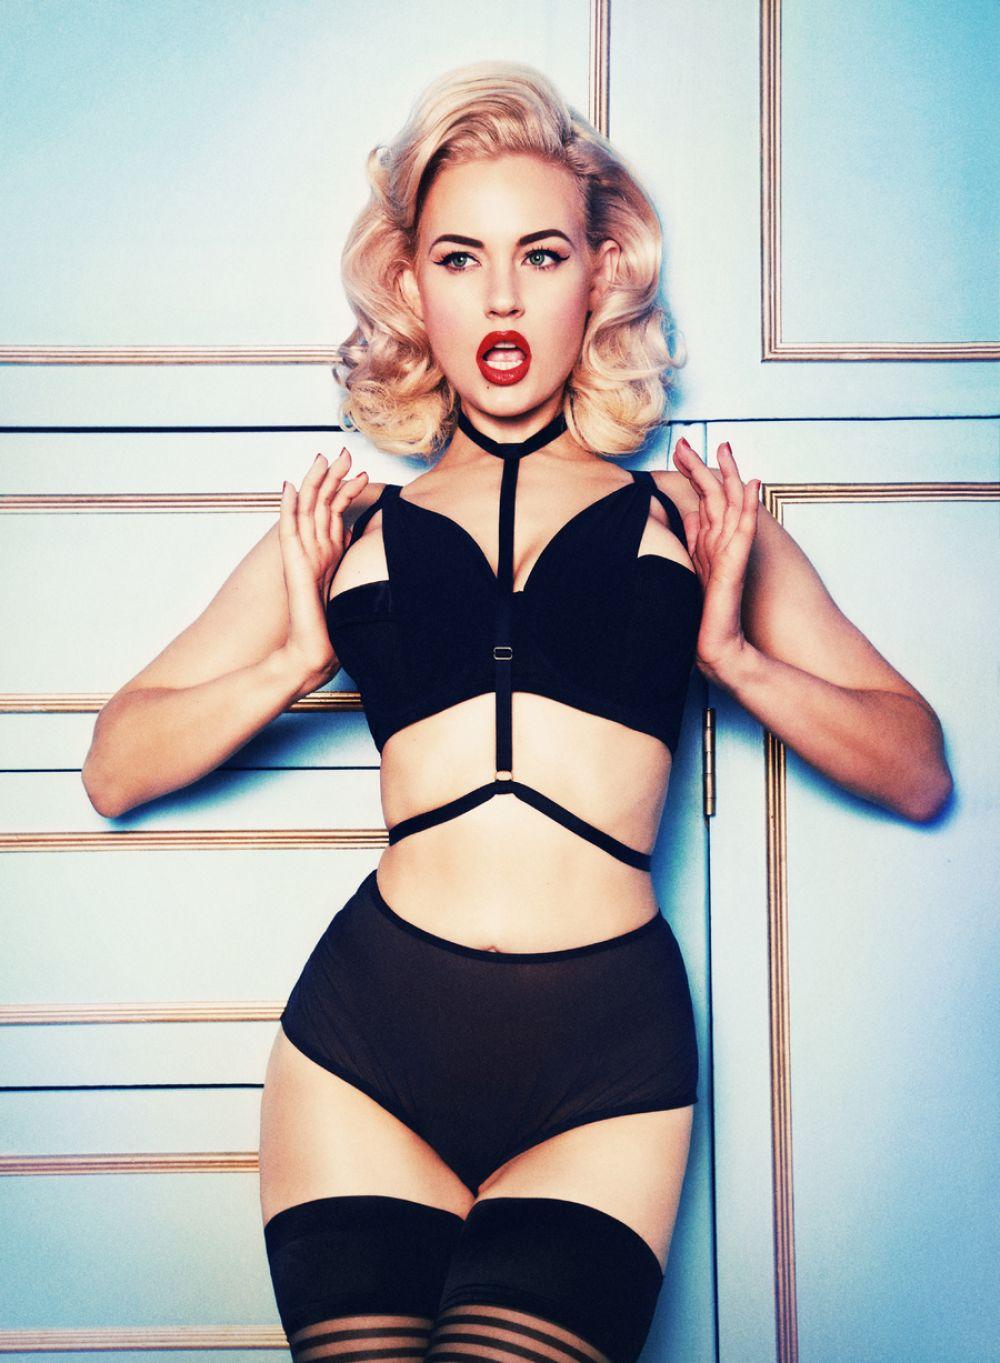 2019 Gia Genevieve nudes (45 foto and video), Sexy, Paparazzi, Instagram, legs 2006